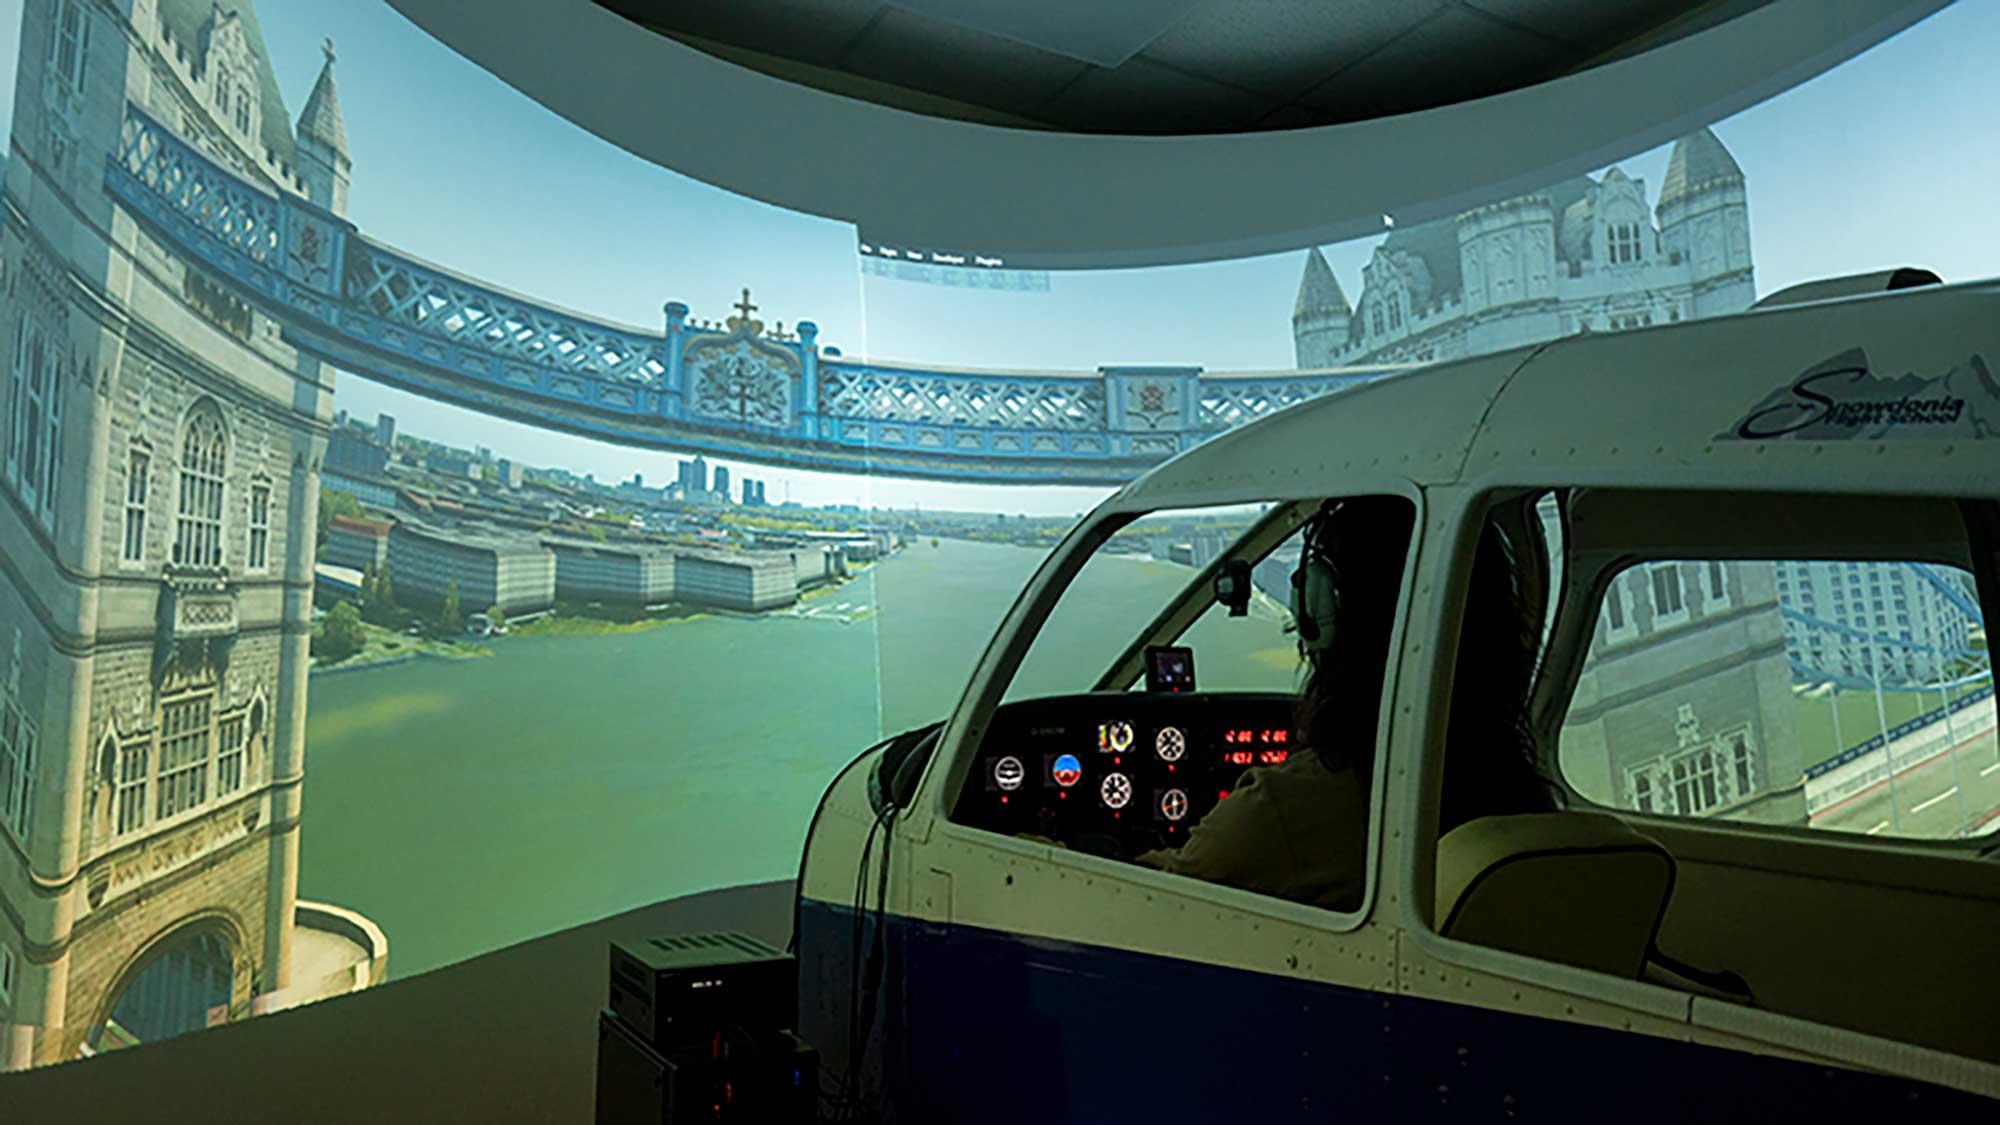 Snowdonia Flight sim